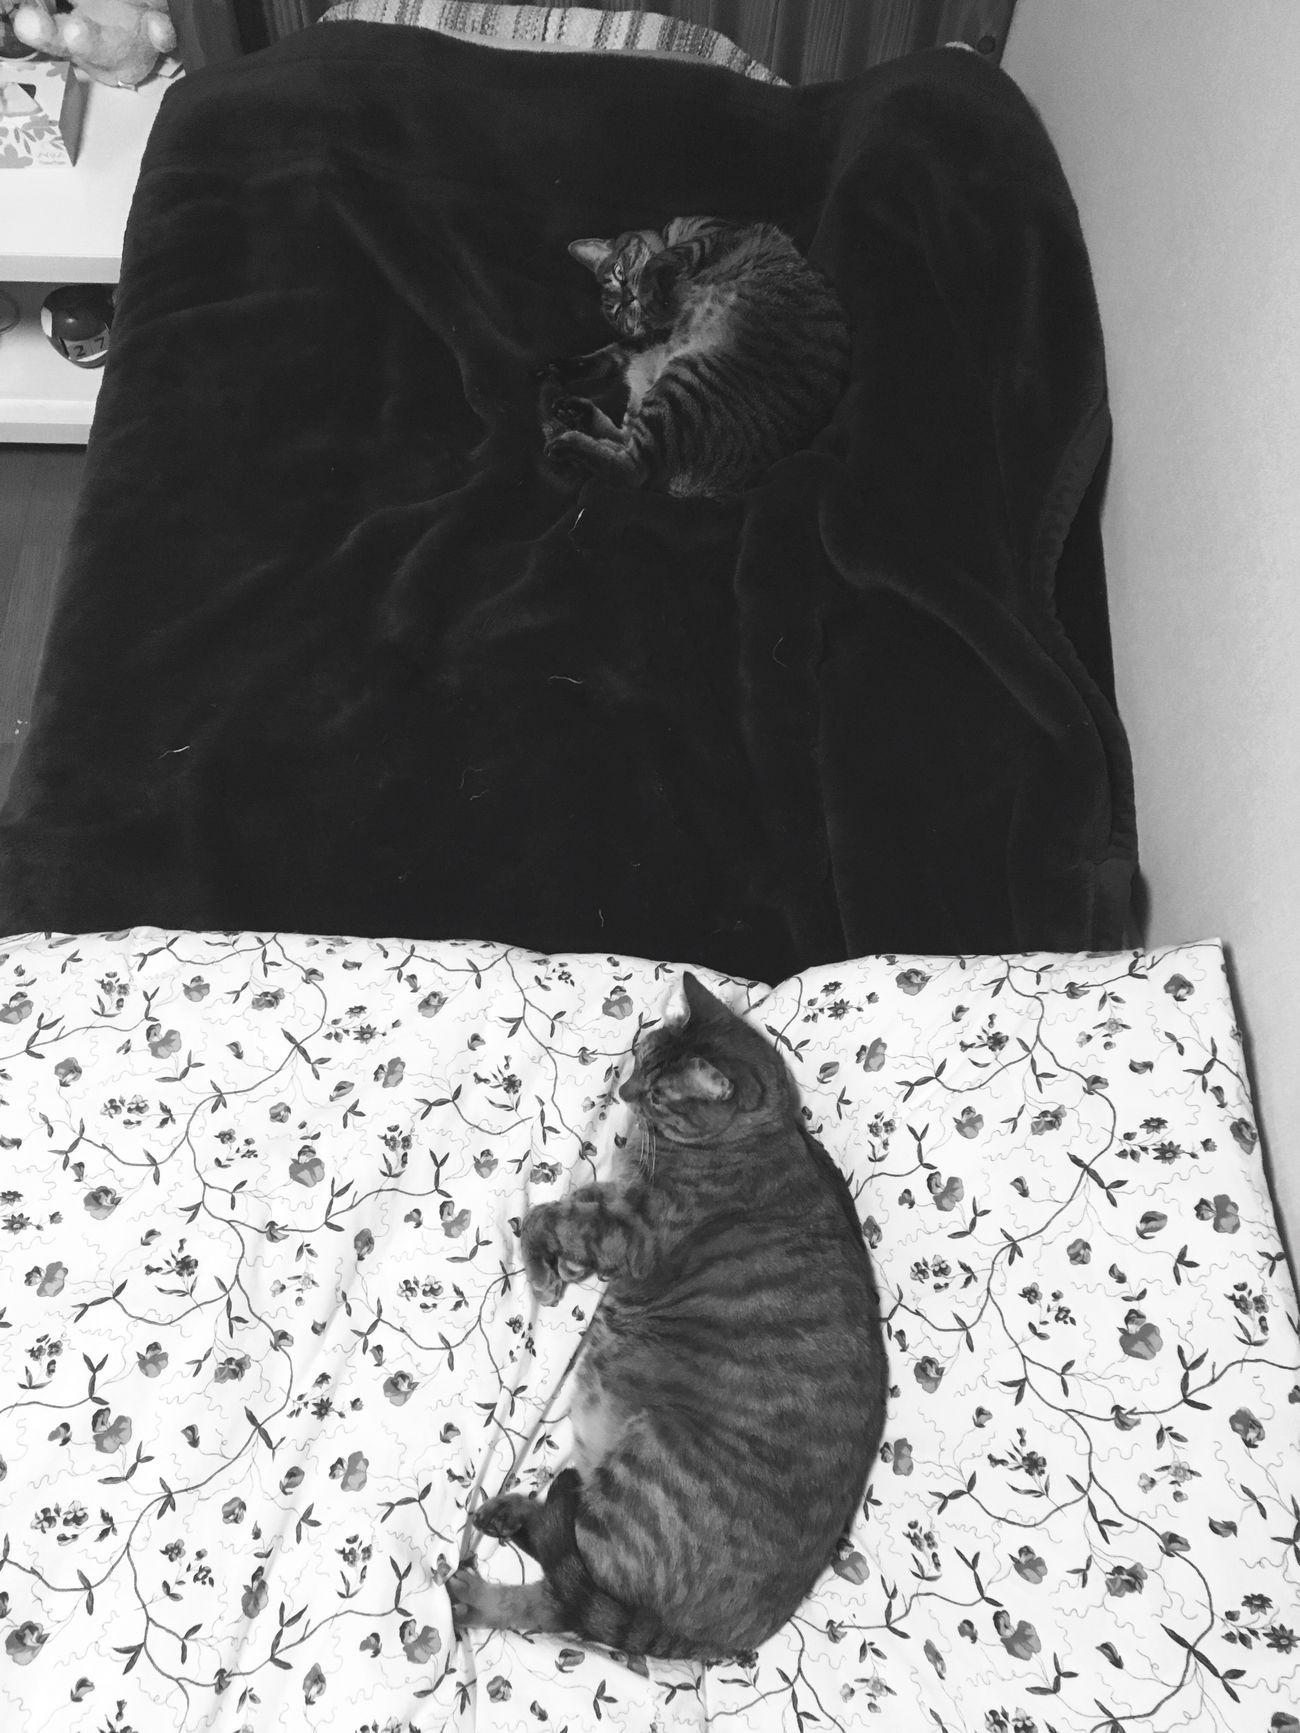 I Love My Cat My Cats Cat Cat♡ Animal Animals Blackandwhite Black & White Blackandwhite Photography Black And White Photography Black And White